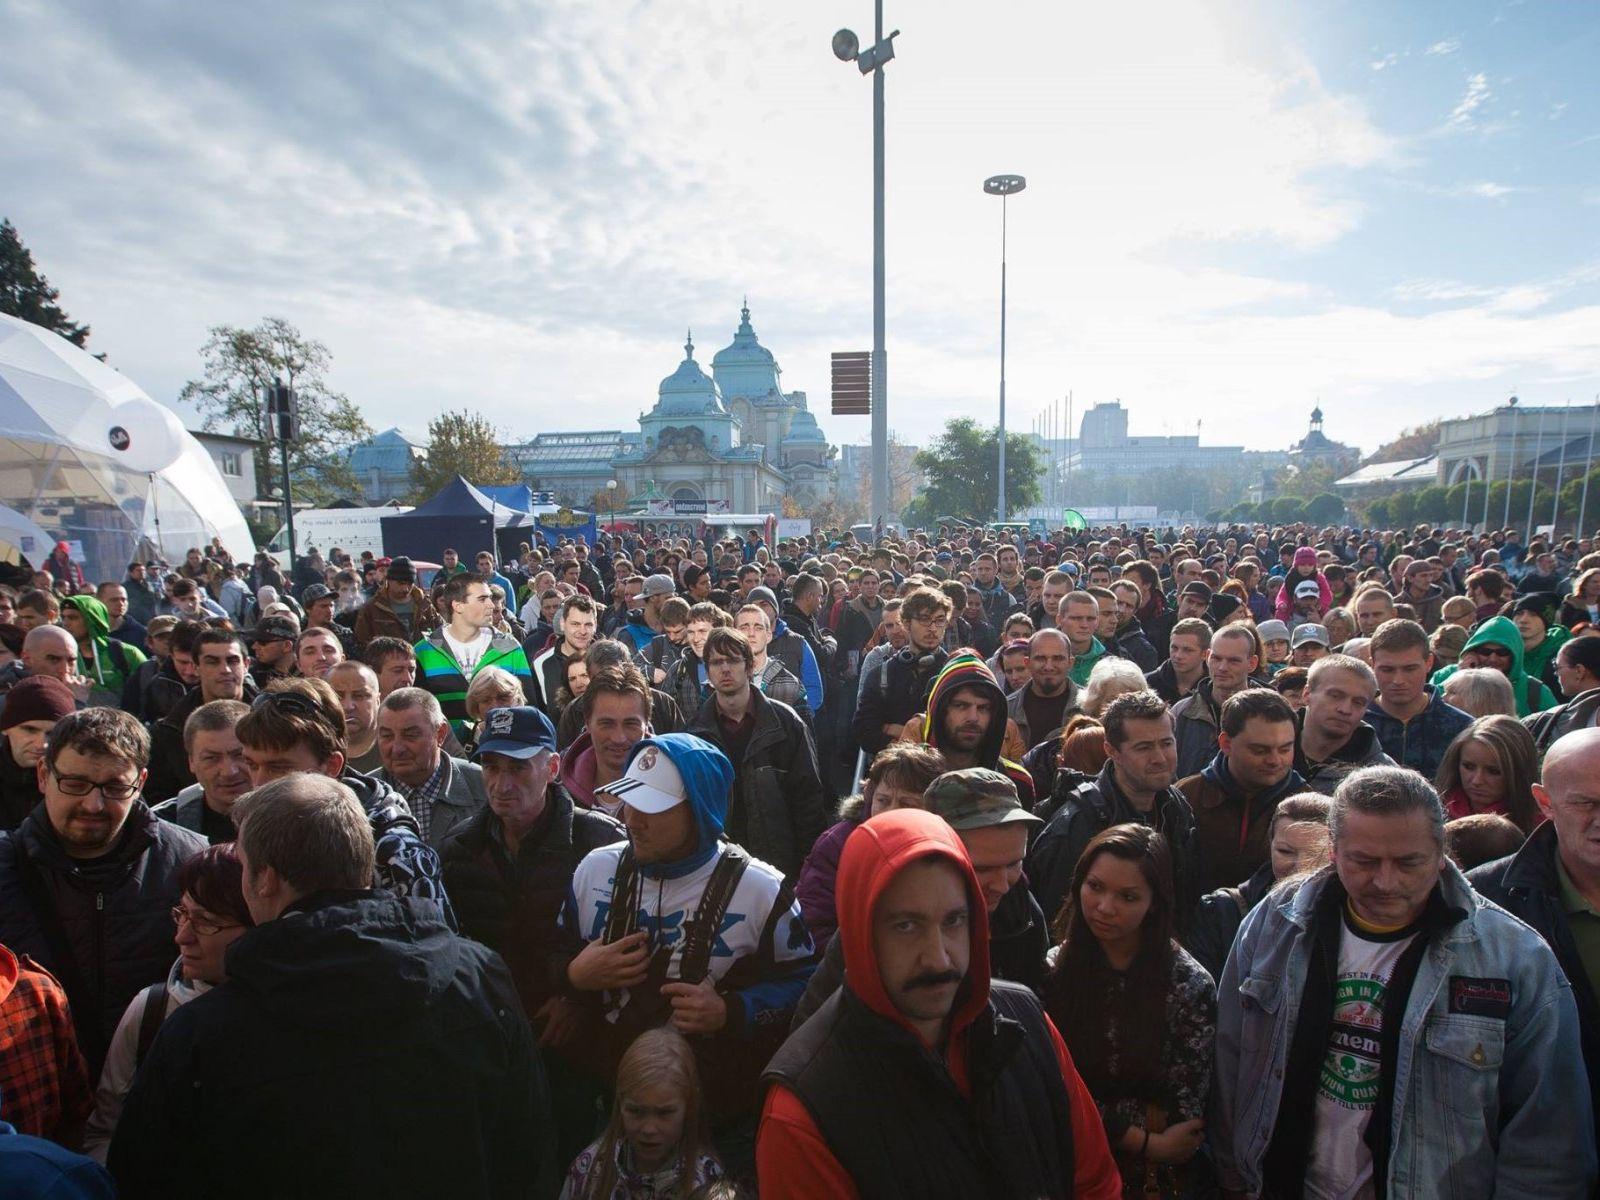 Putovanje Cannafest Prag 2019. - Rasprodano!: 6. legendarno putovanje kanabis fanova